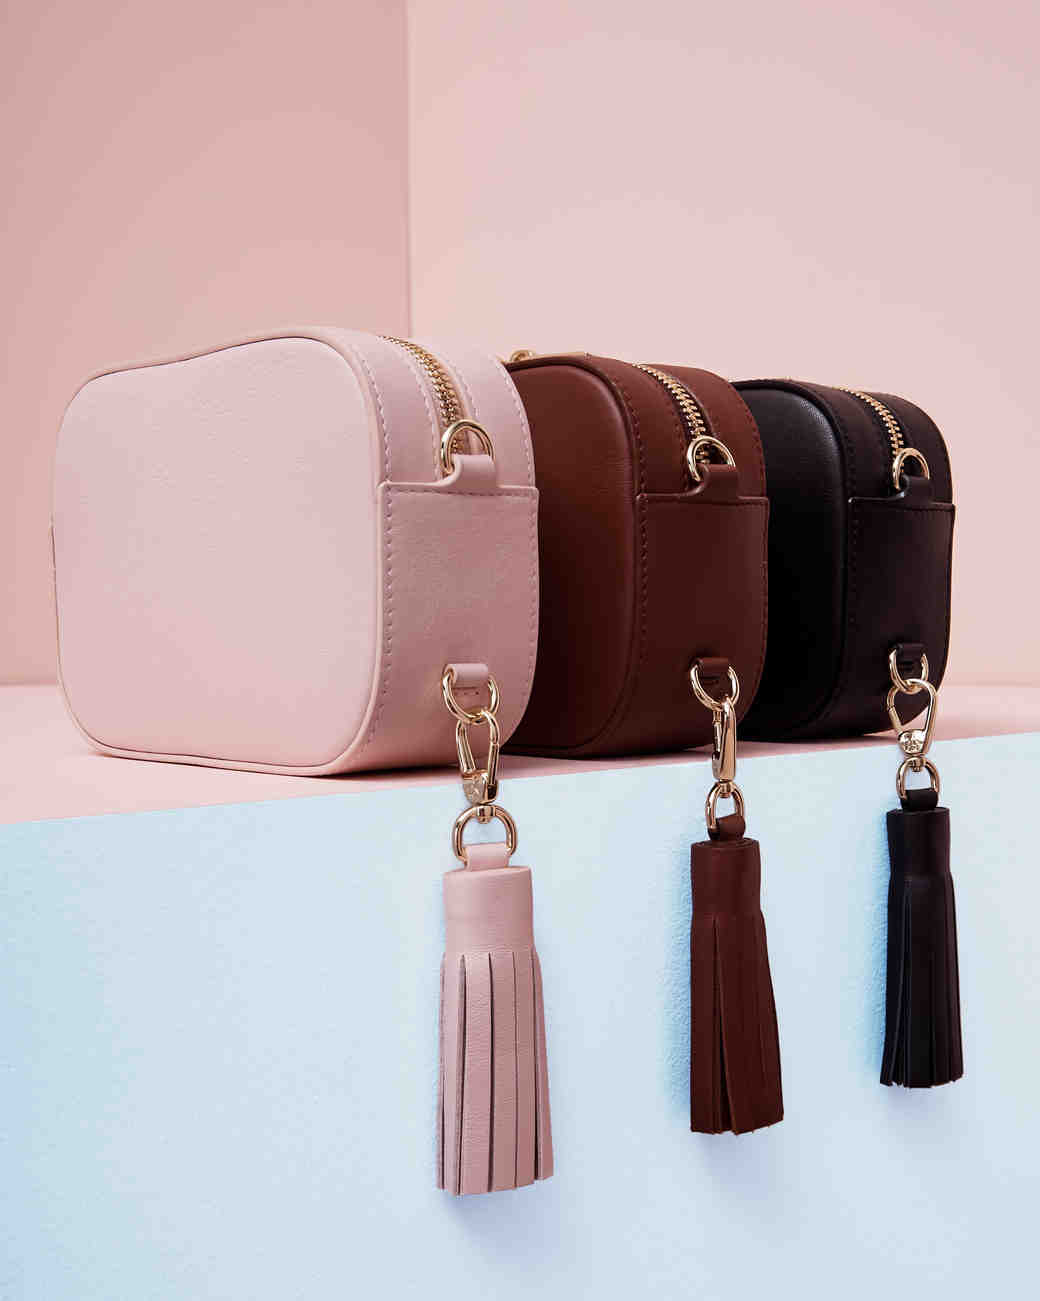 Bridesmaid gift idea Pop and Suki camera bag cross-body purse